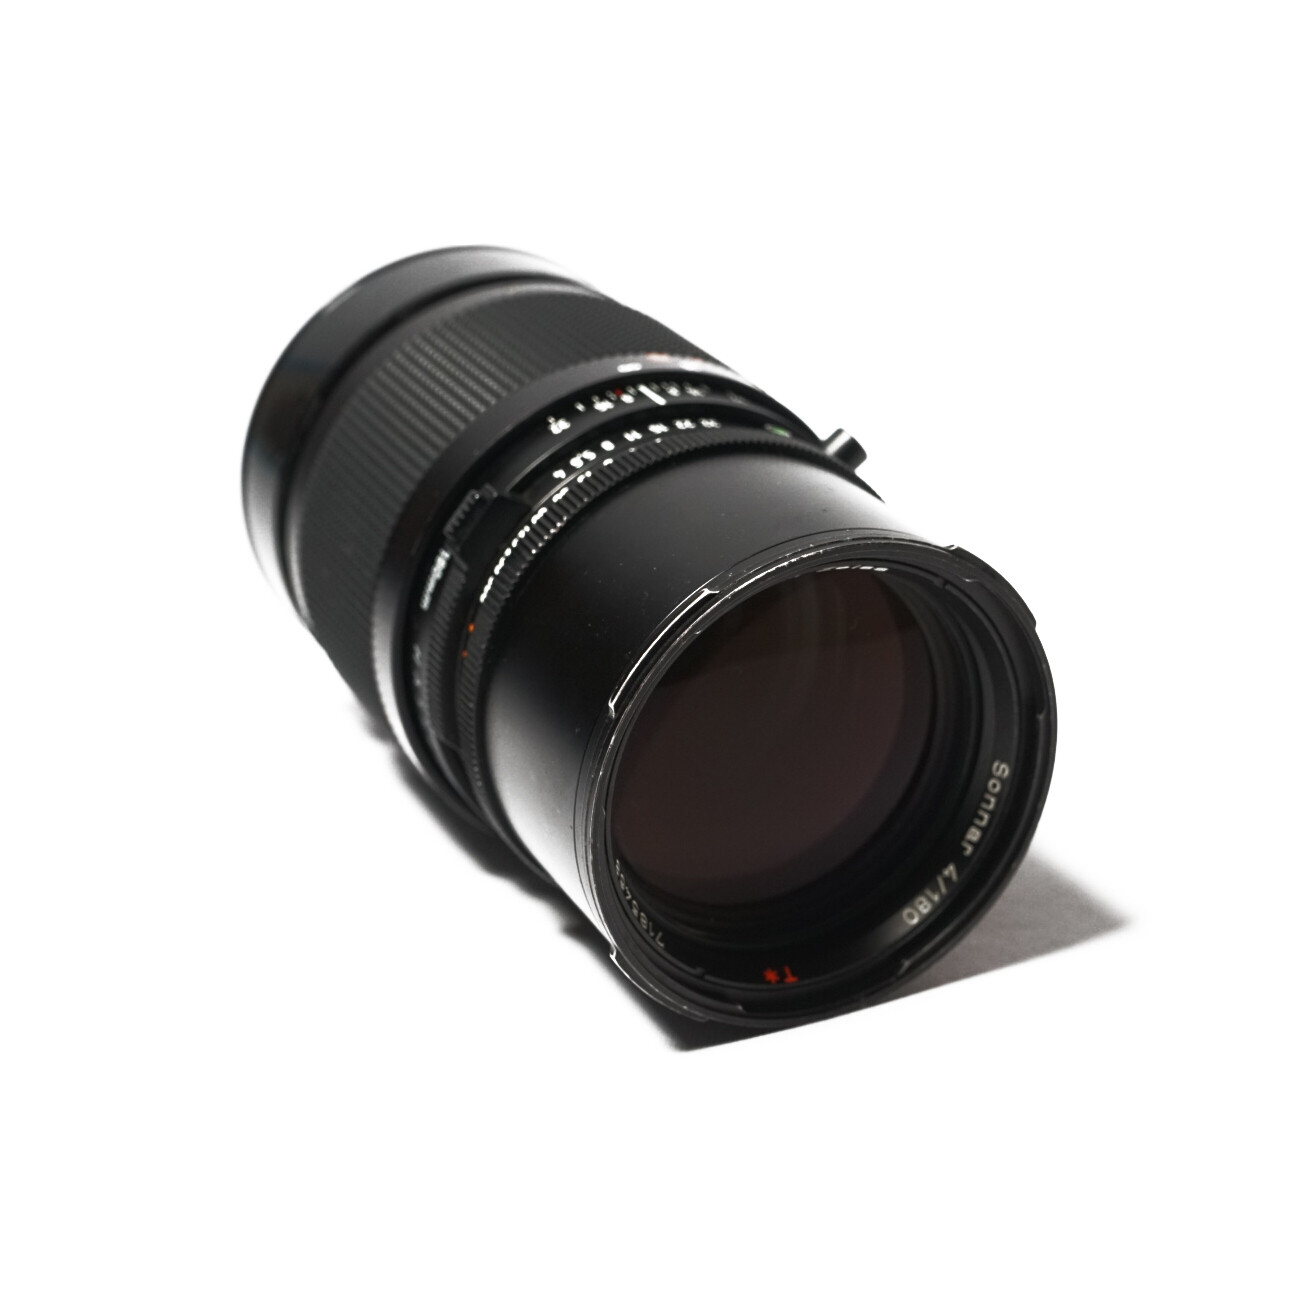 Carl Zeiss SONNAR 180mm f/4 CF T*